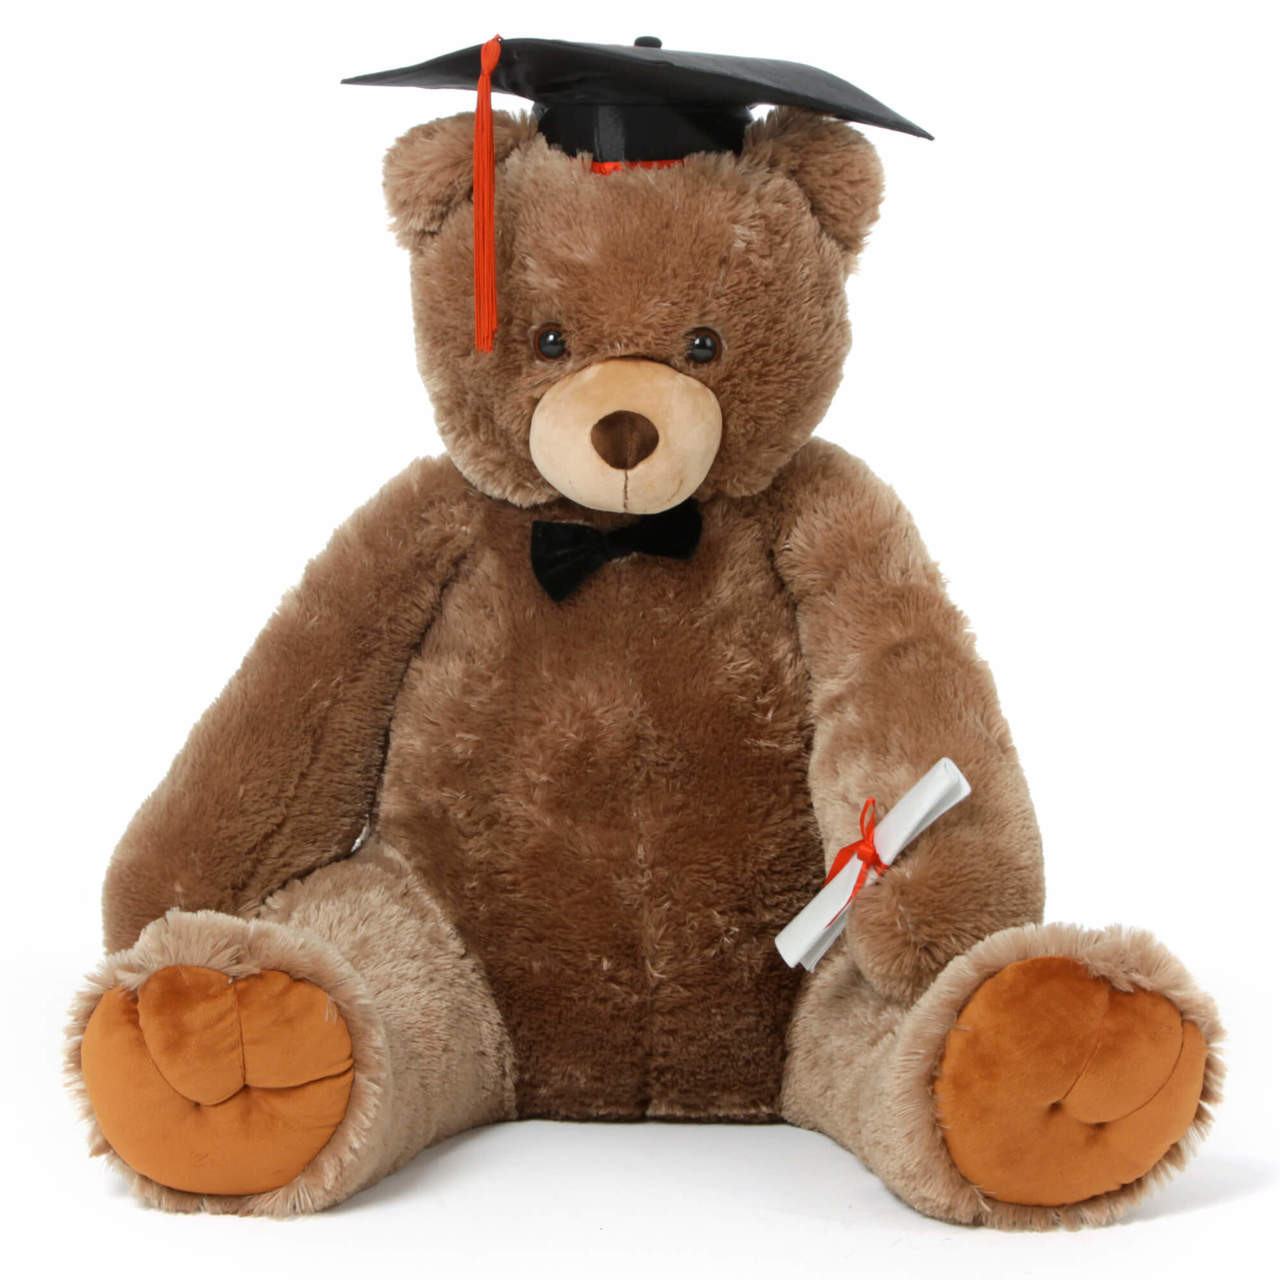 32in Graduation teddy bear Sweetie Tubs has diploma, black cap & bowtie